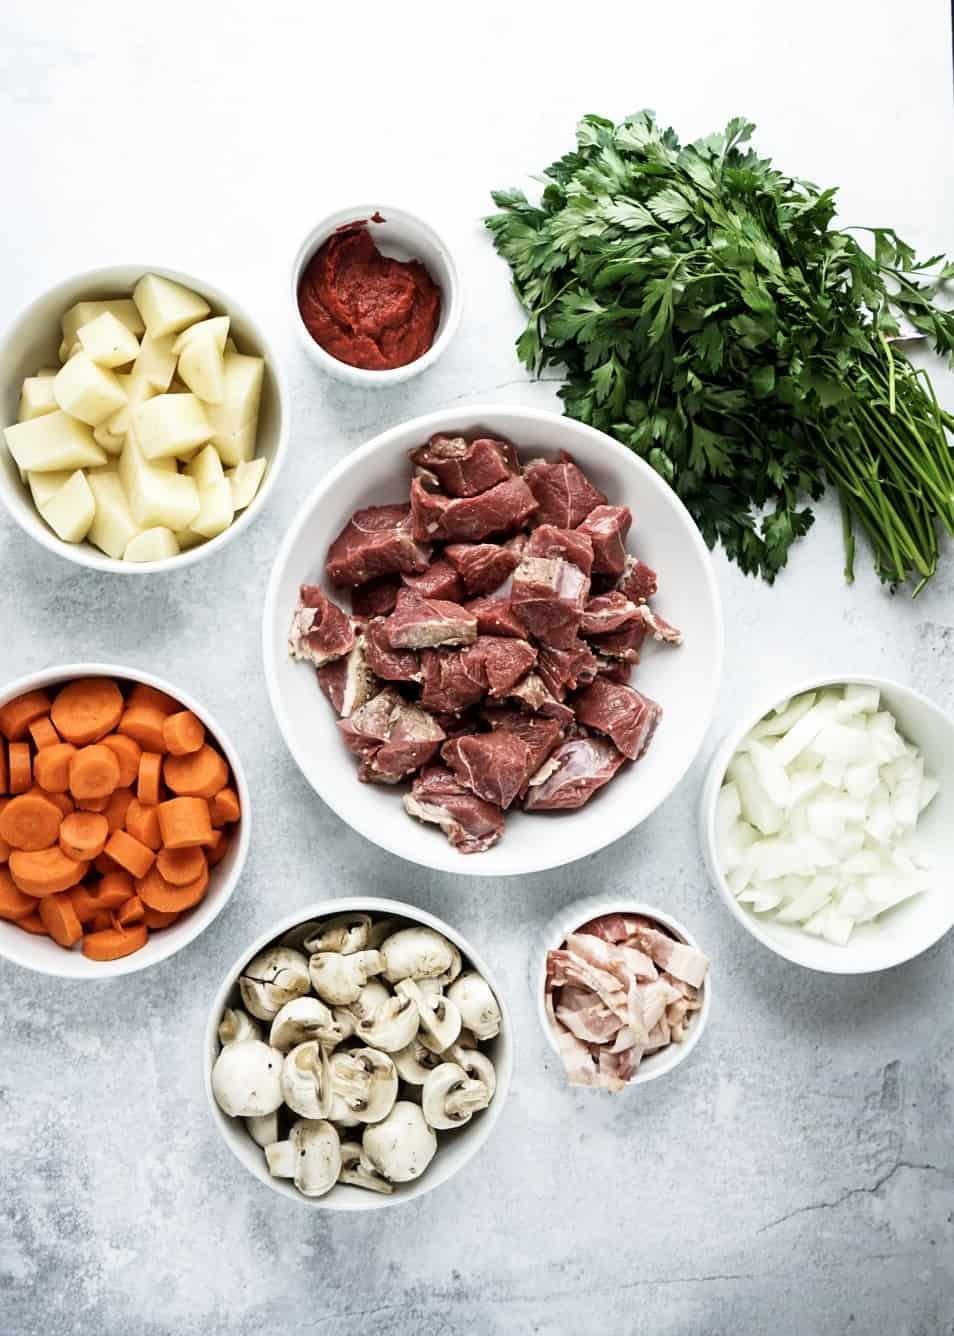 Instantpot Lamb Stew ingredients in bowls